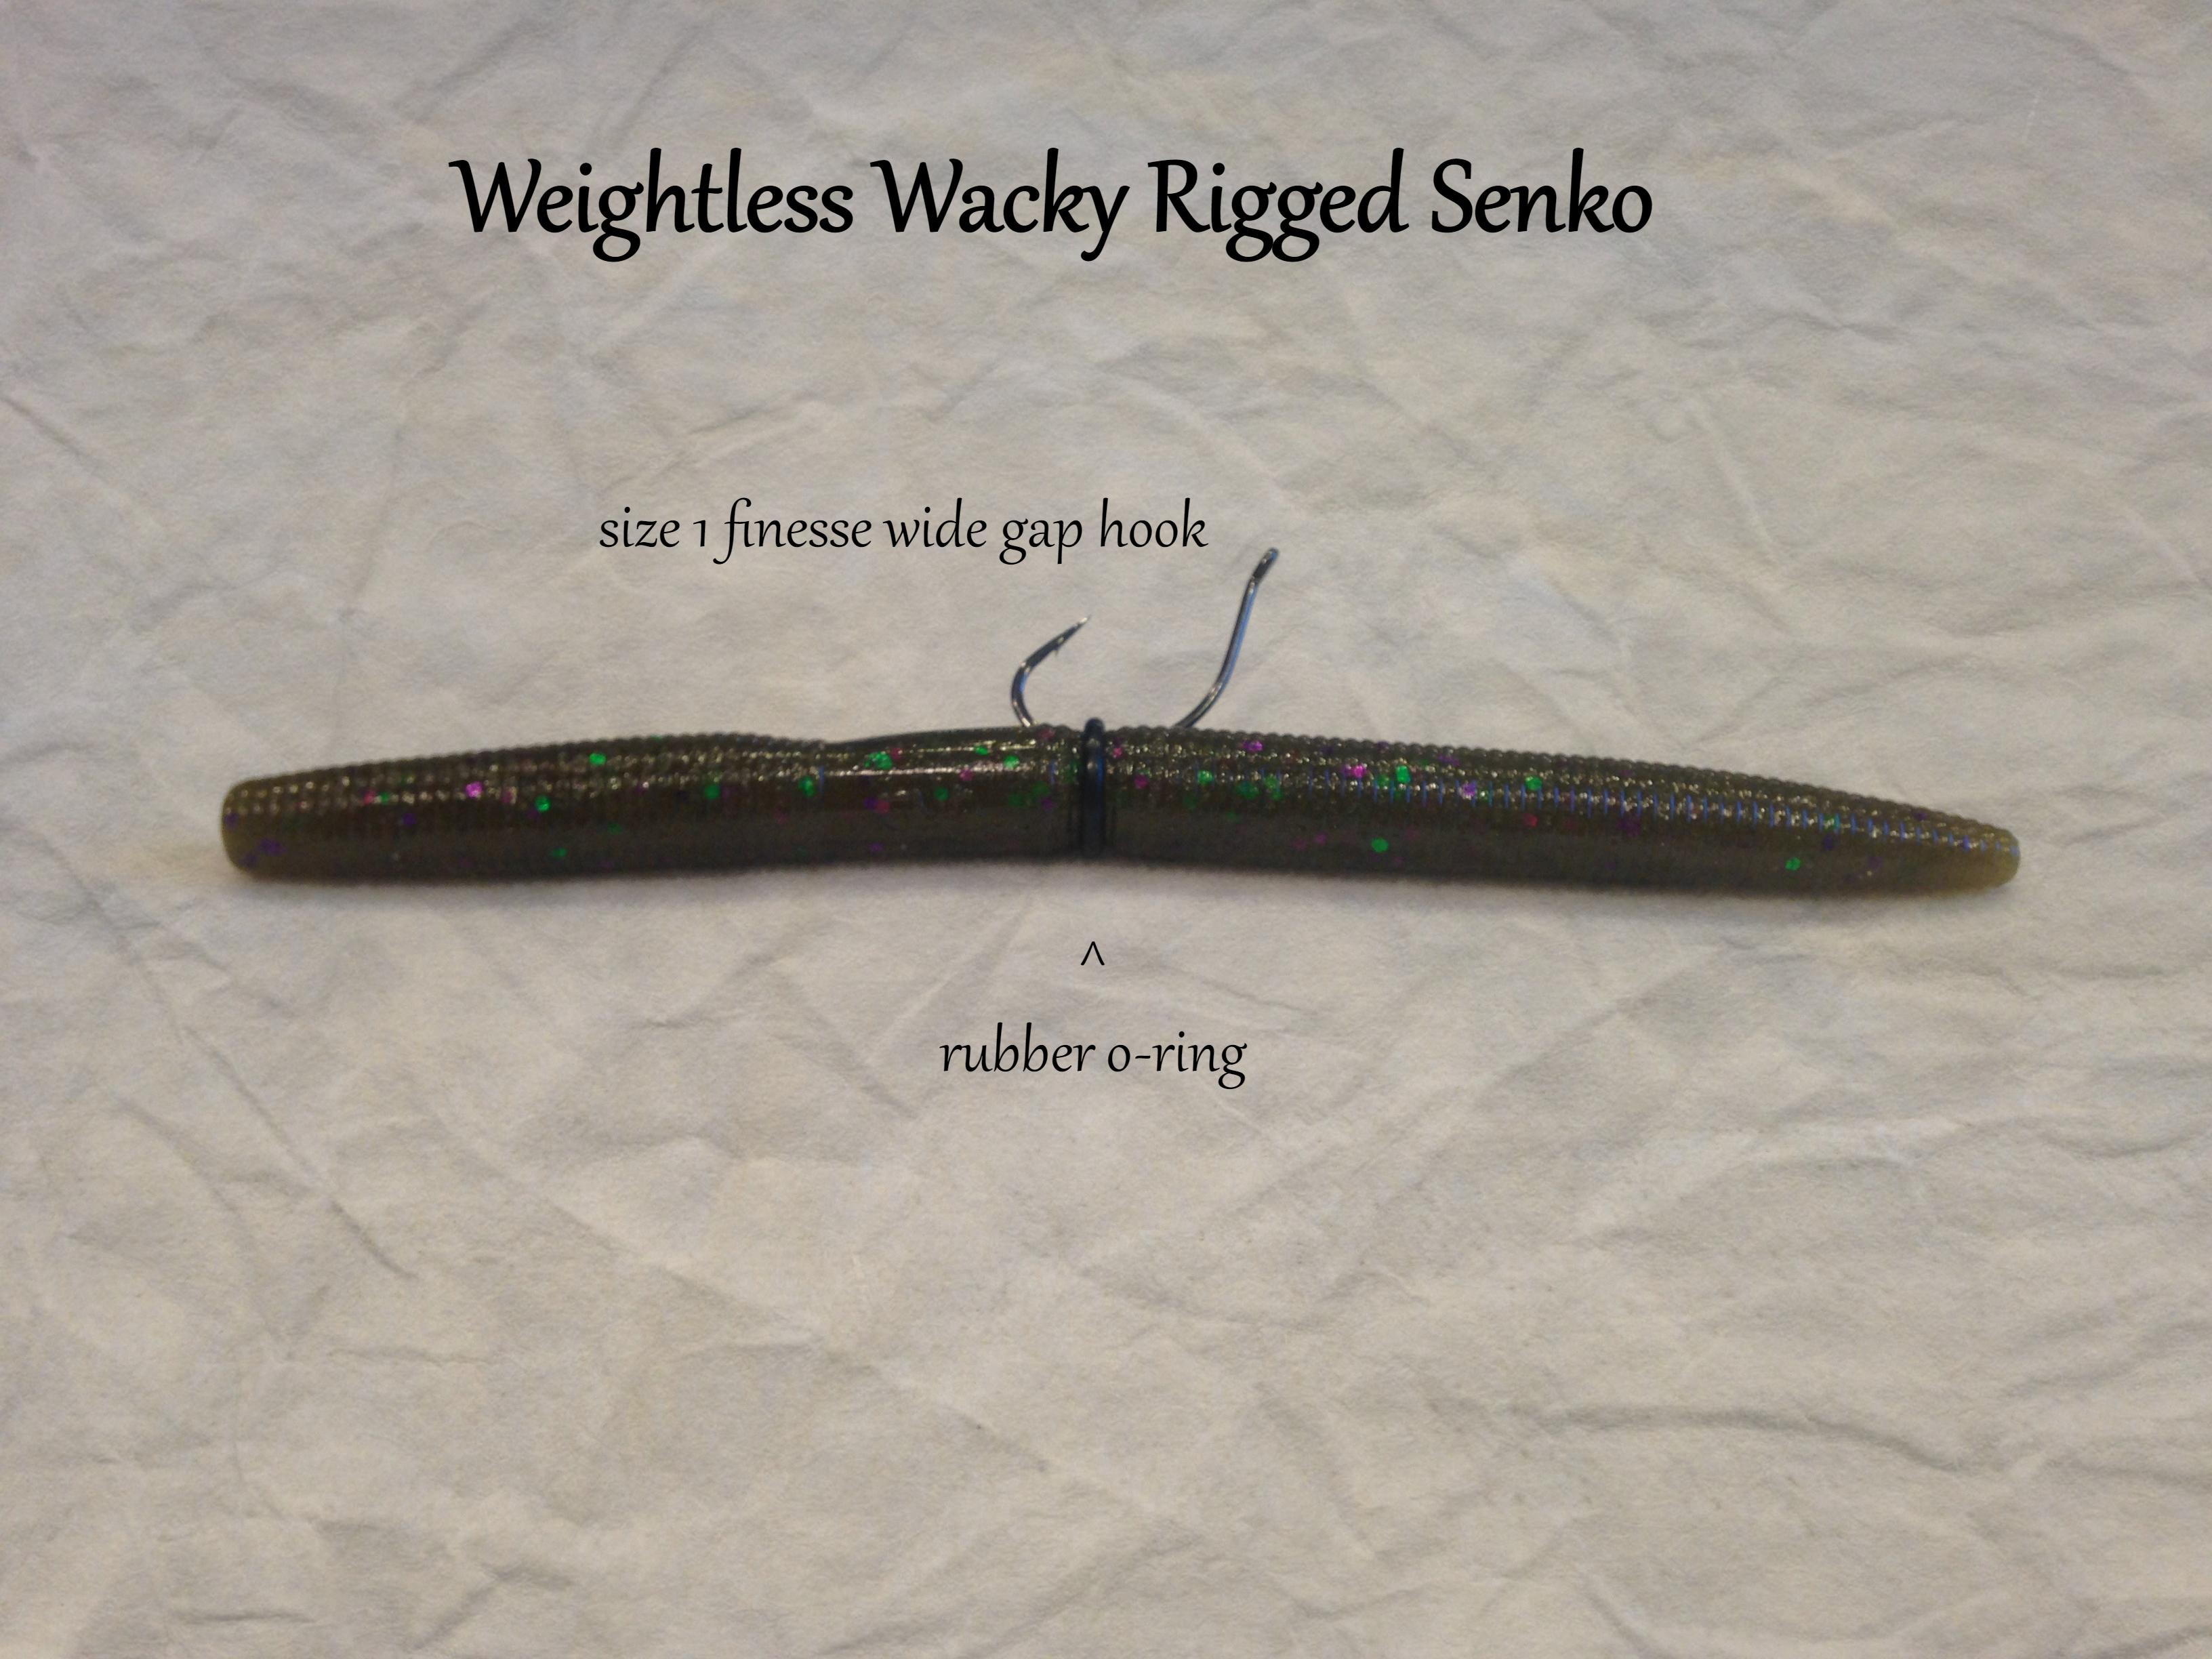 wacky rigged senko